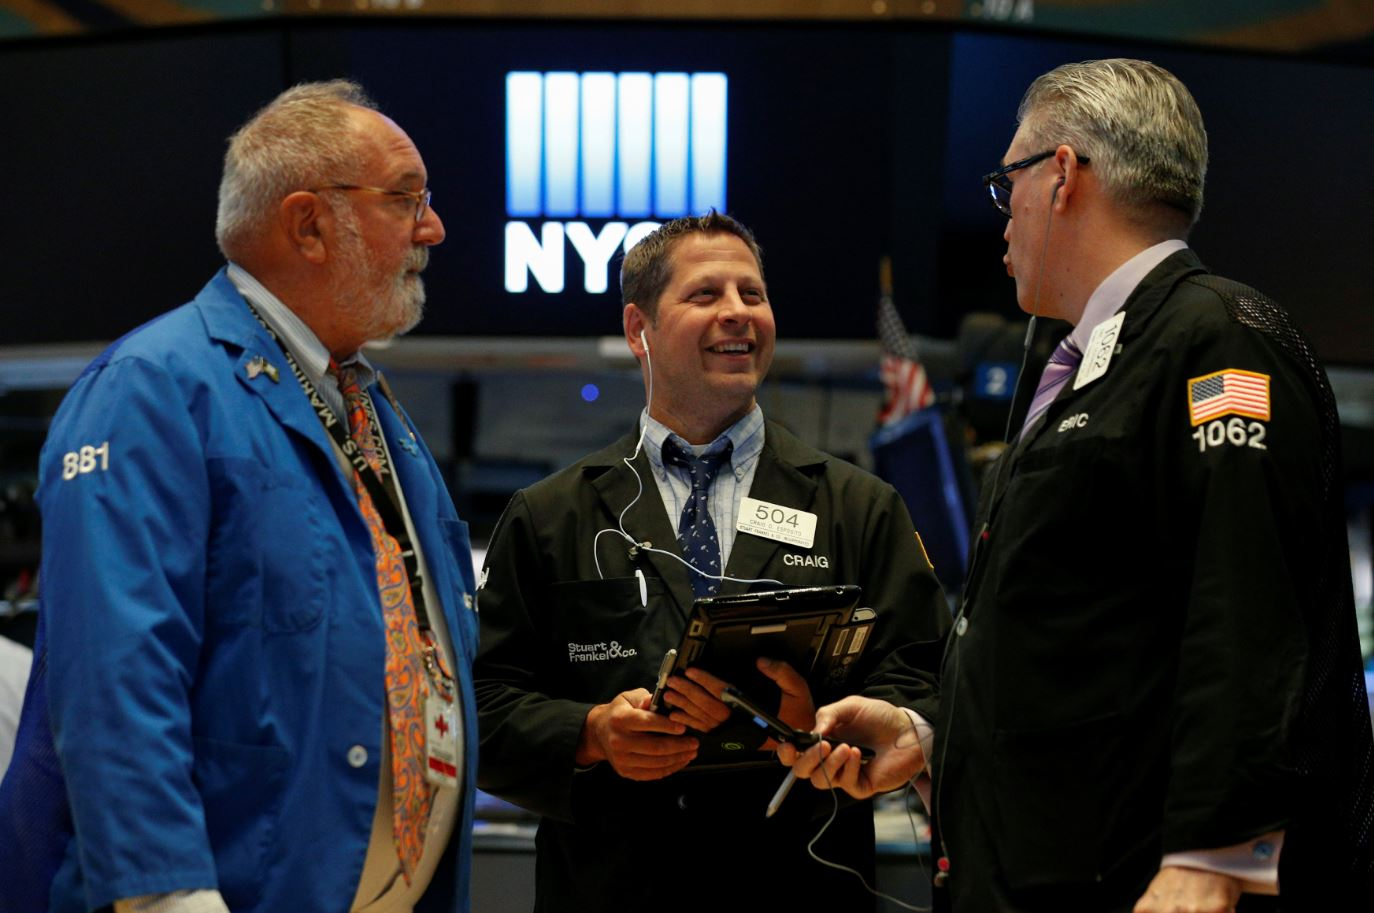 Tras reportes trimestrales, Wall Street revierte pérdidas